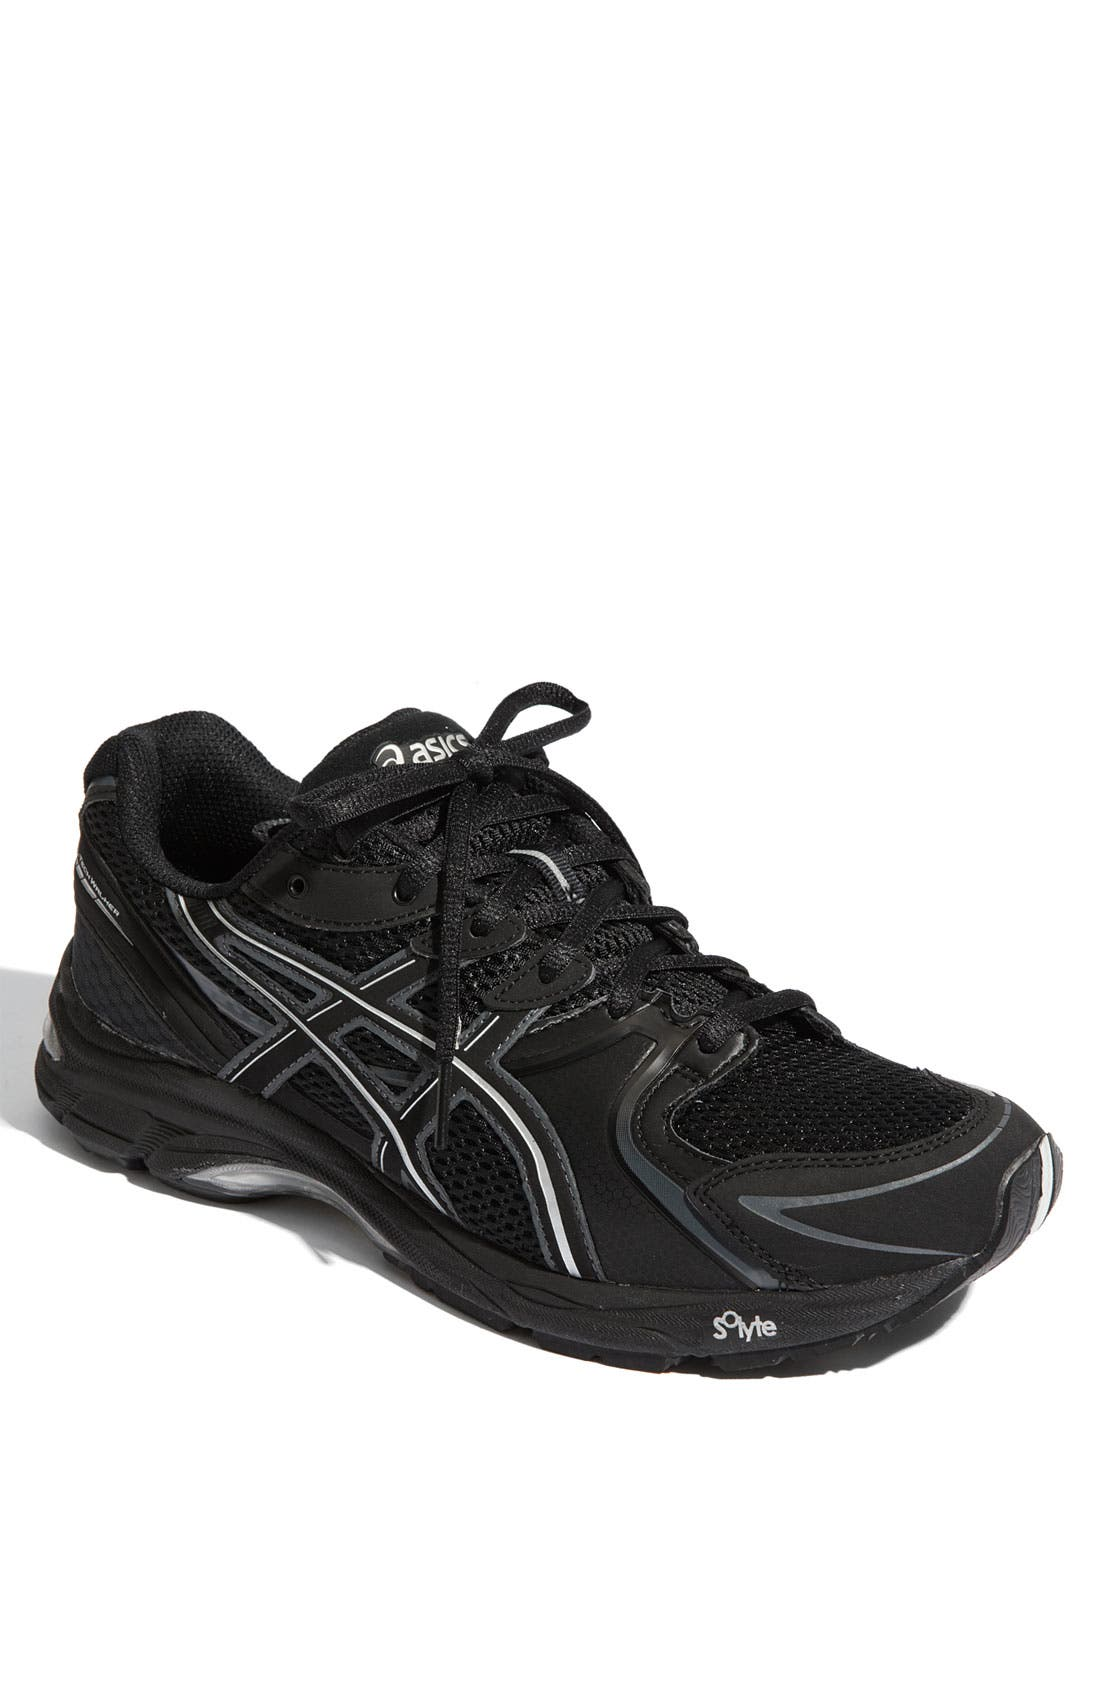 Alternate Image 1 Selected - ASICS® 'Gel-Tech Walker Neo' Walking Shoe (Men) (Online Only)